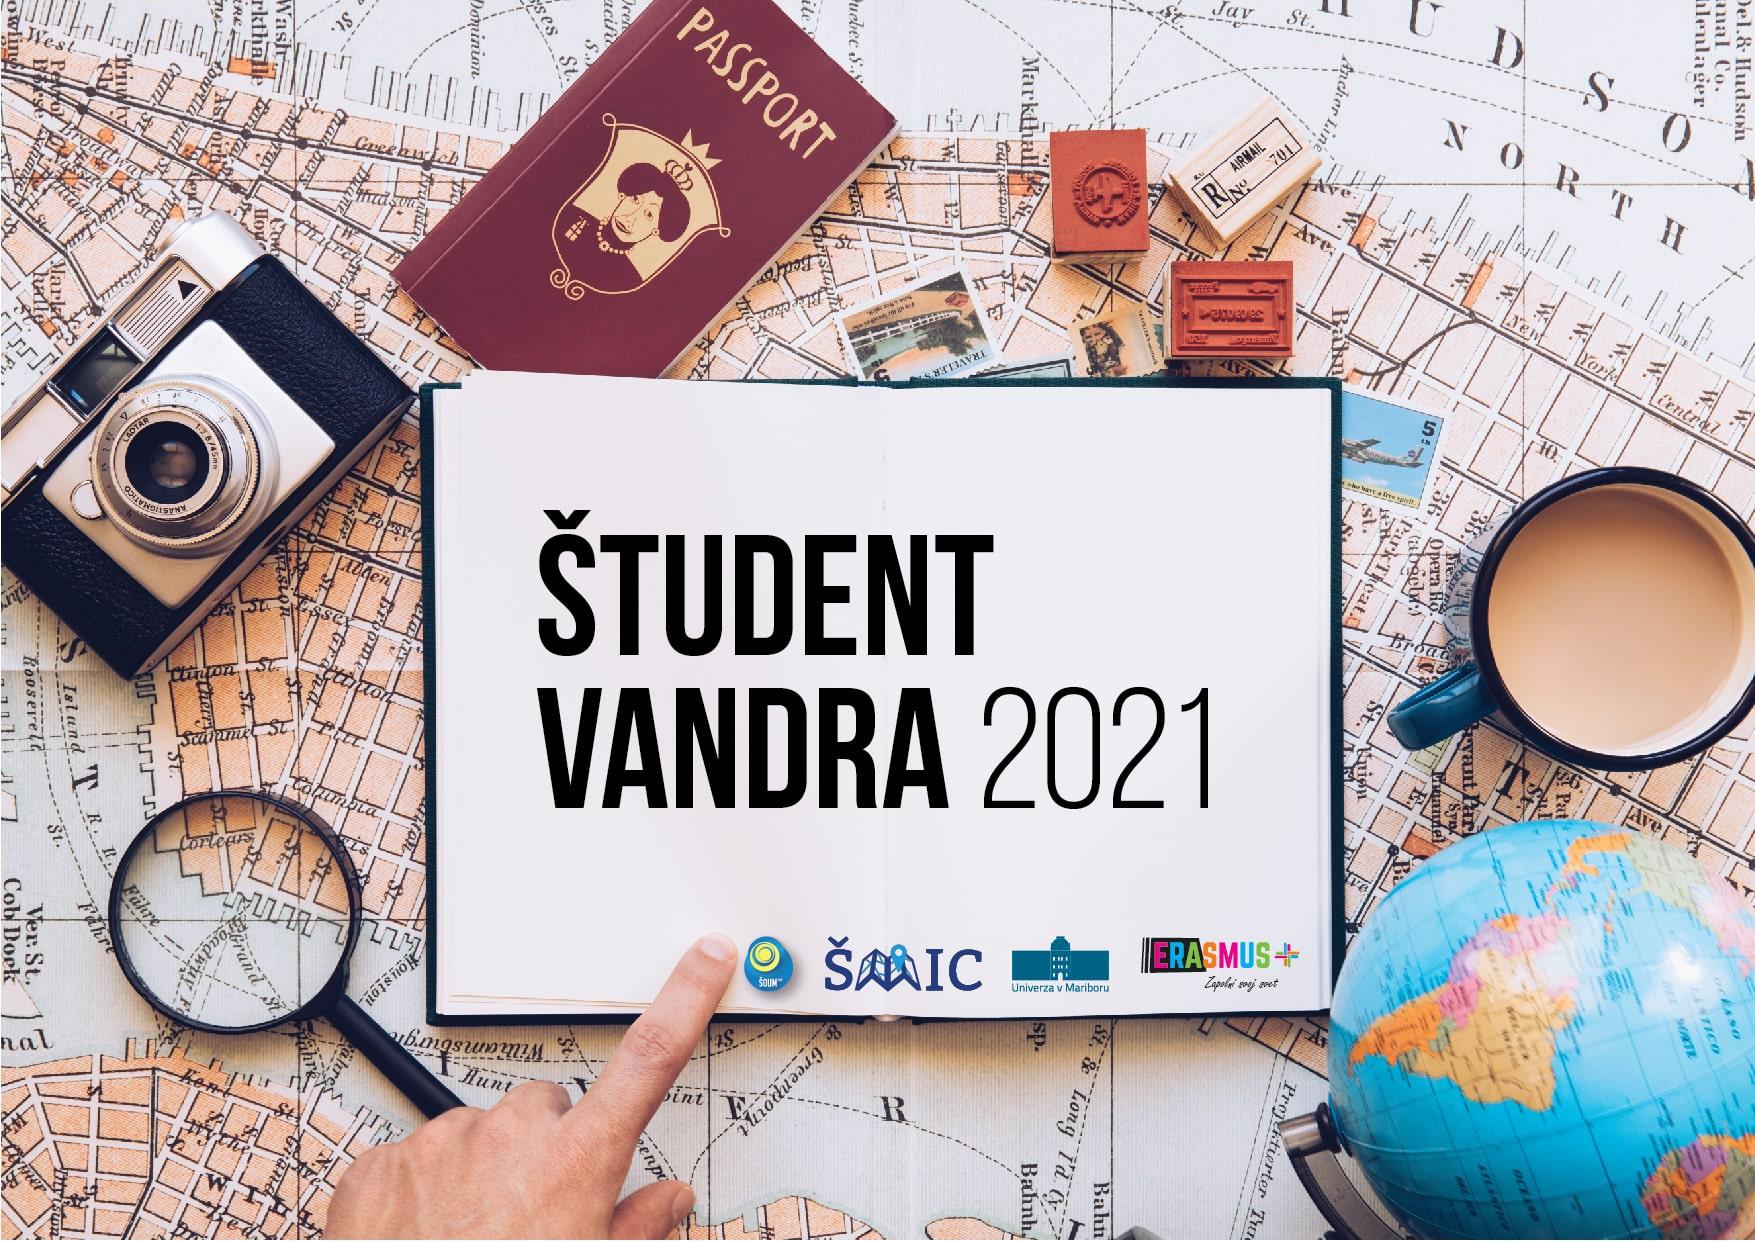 Natečaj »Študent vandra 2021«